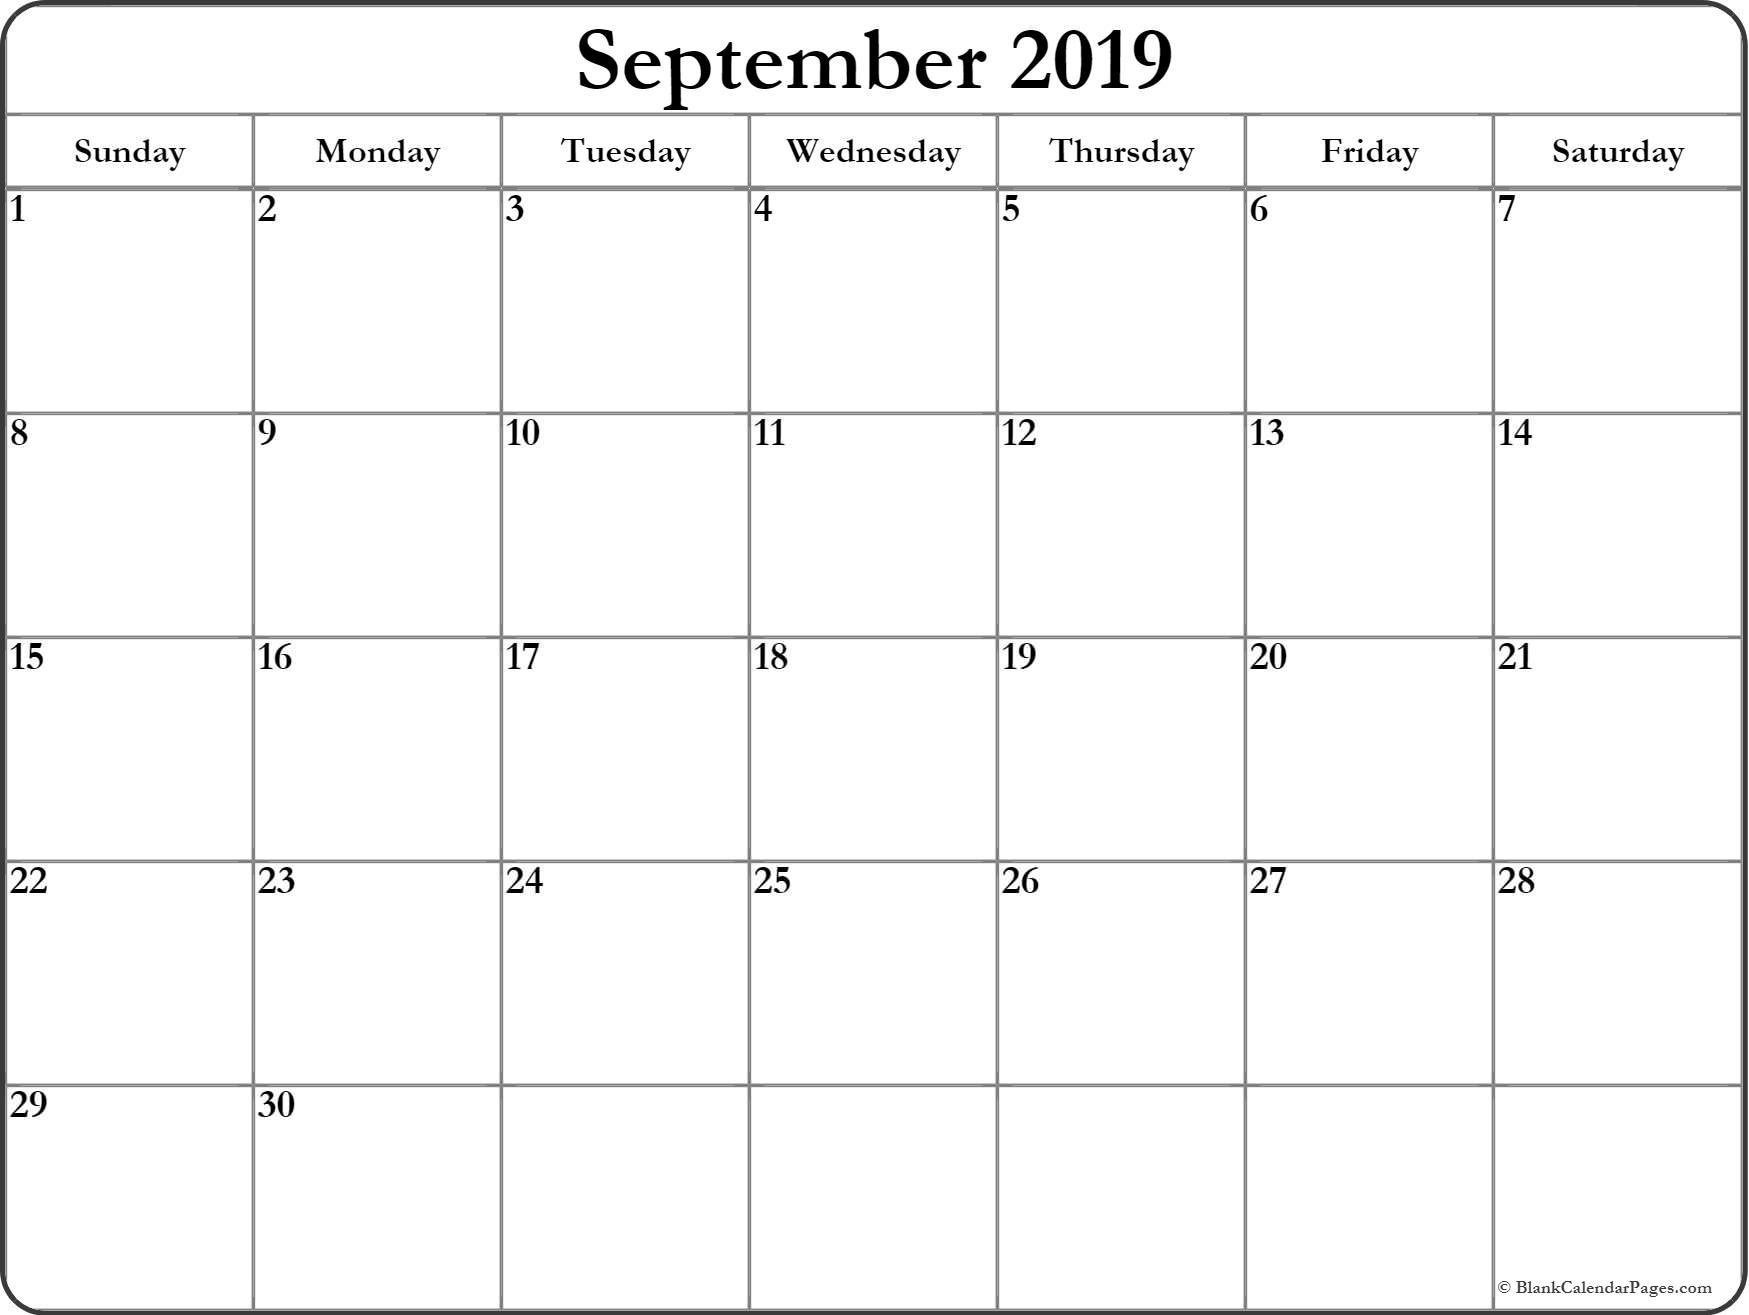 September 2019 Calendar | Free Printable Monthly Calendars throughout Printable Blank Calendar Pages For September